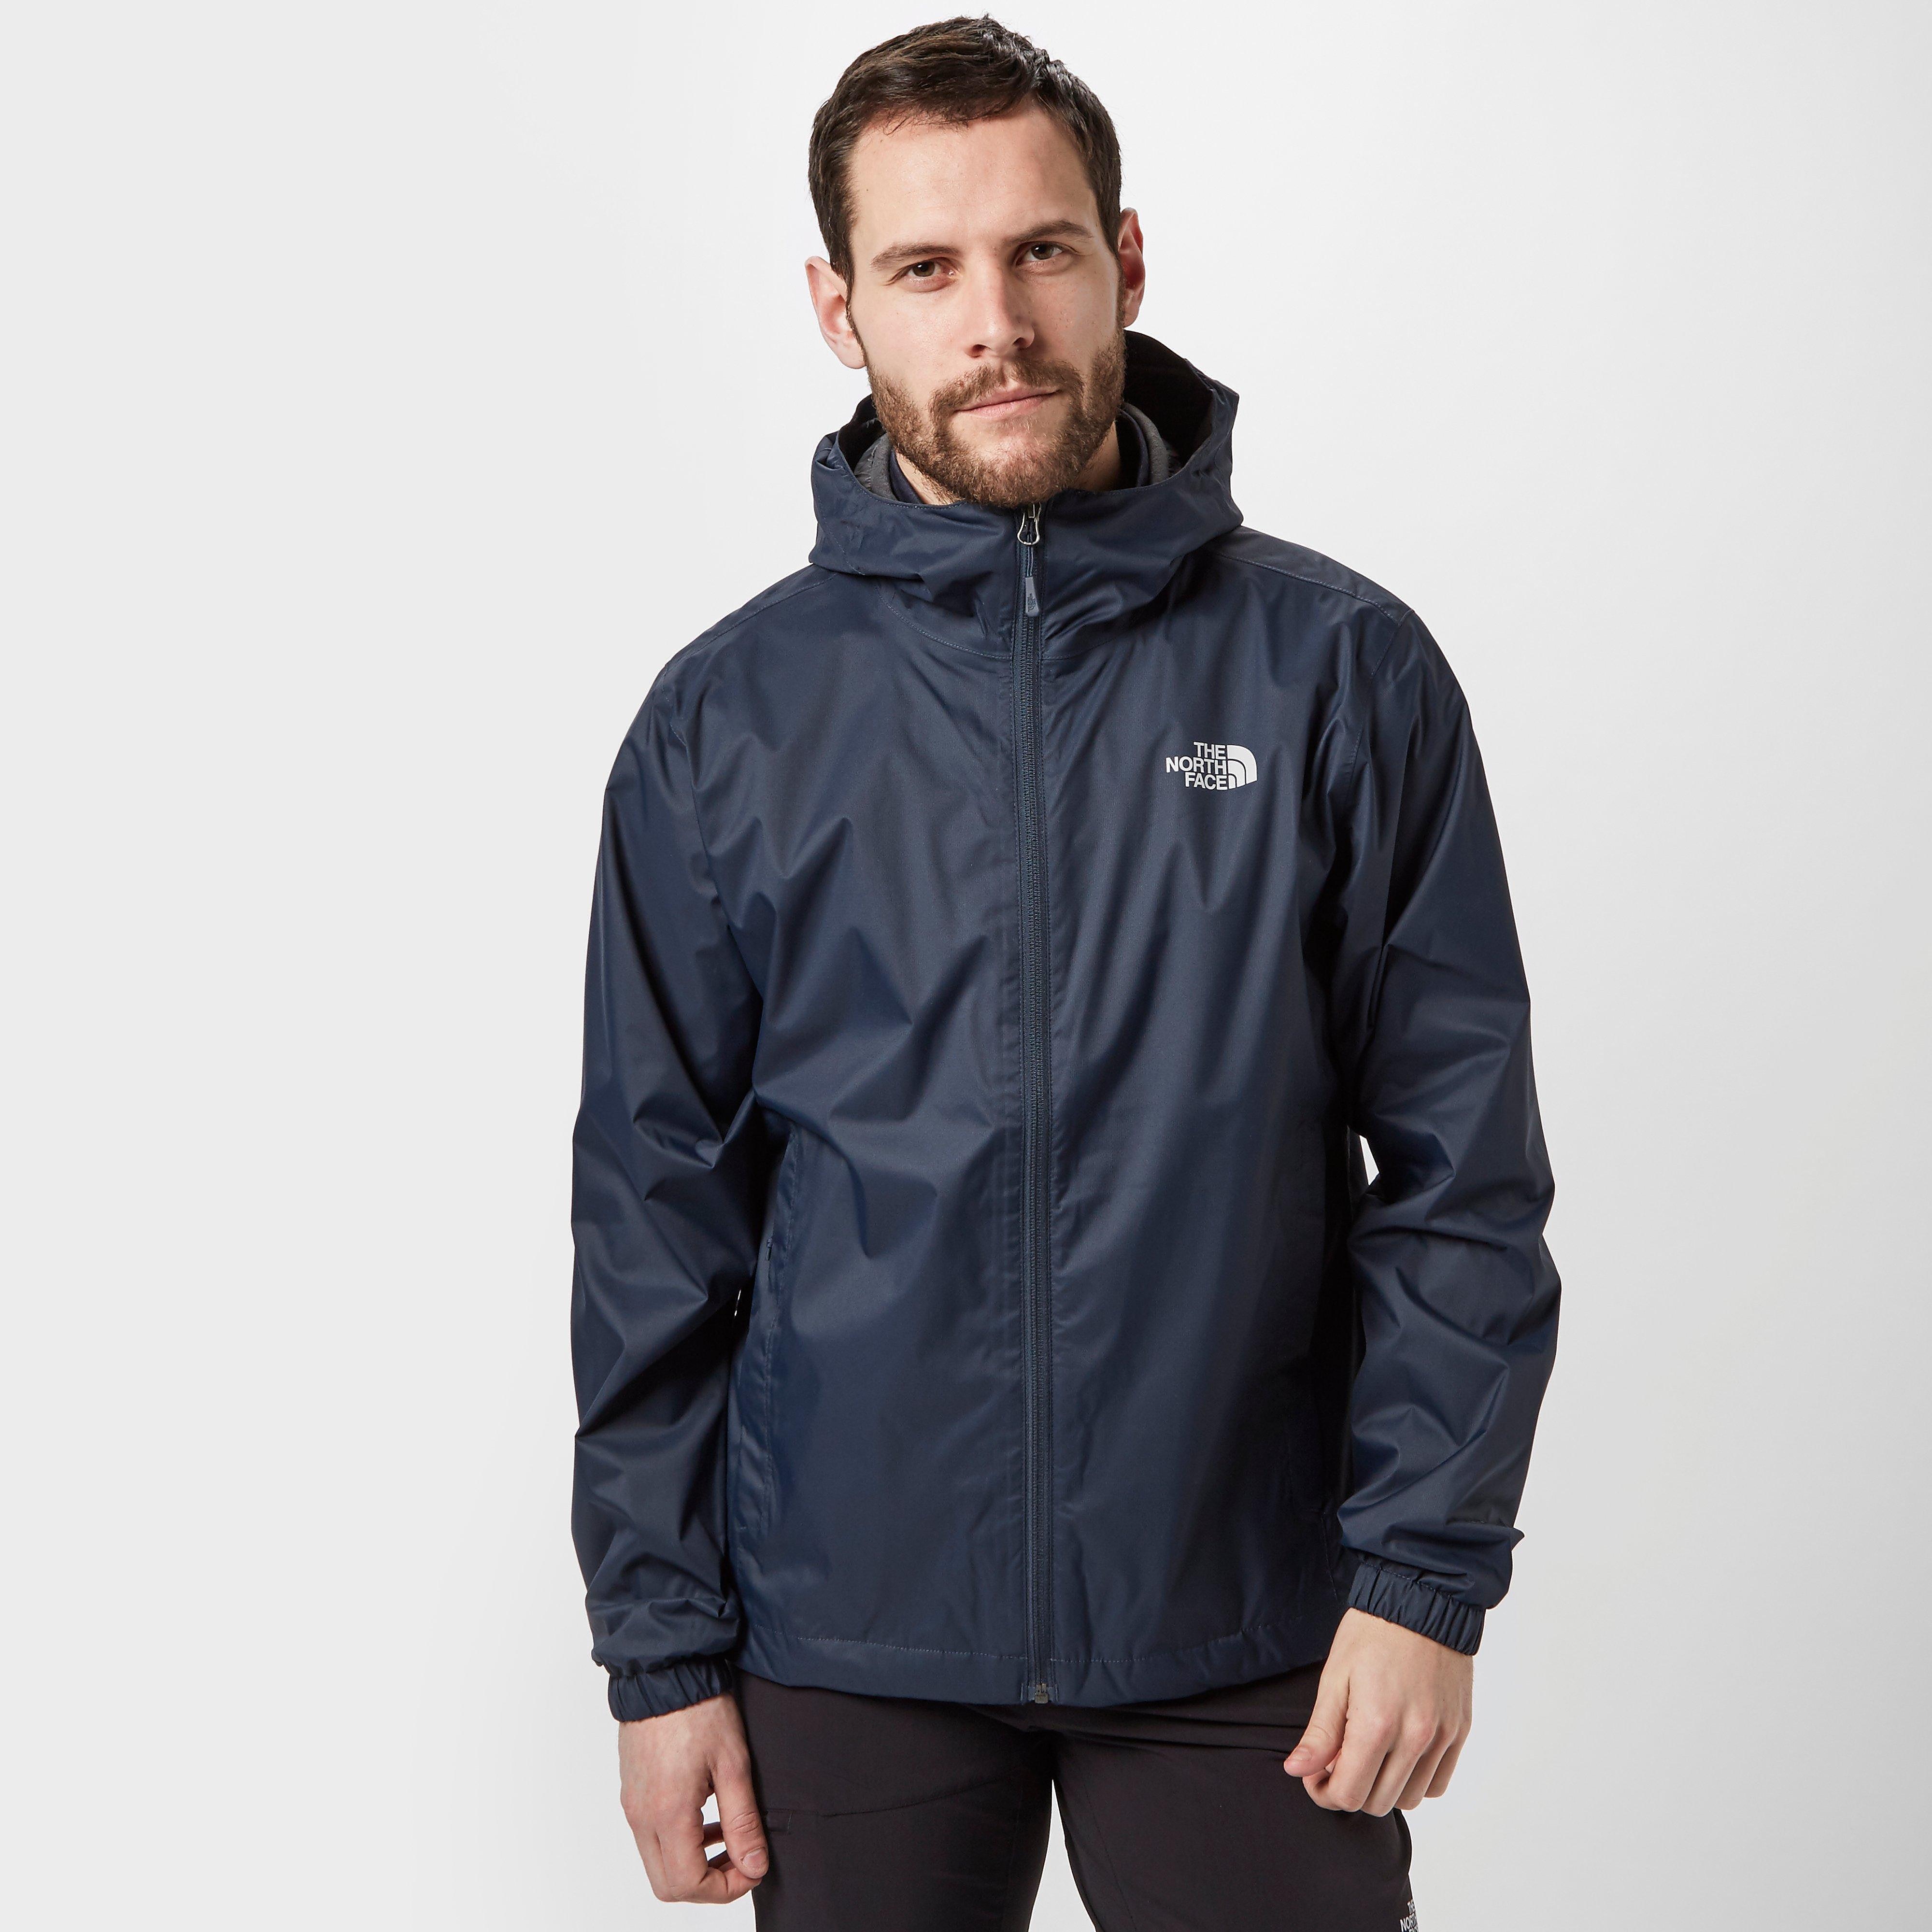 The North Face Quest Men's Jacket